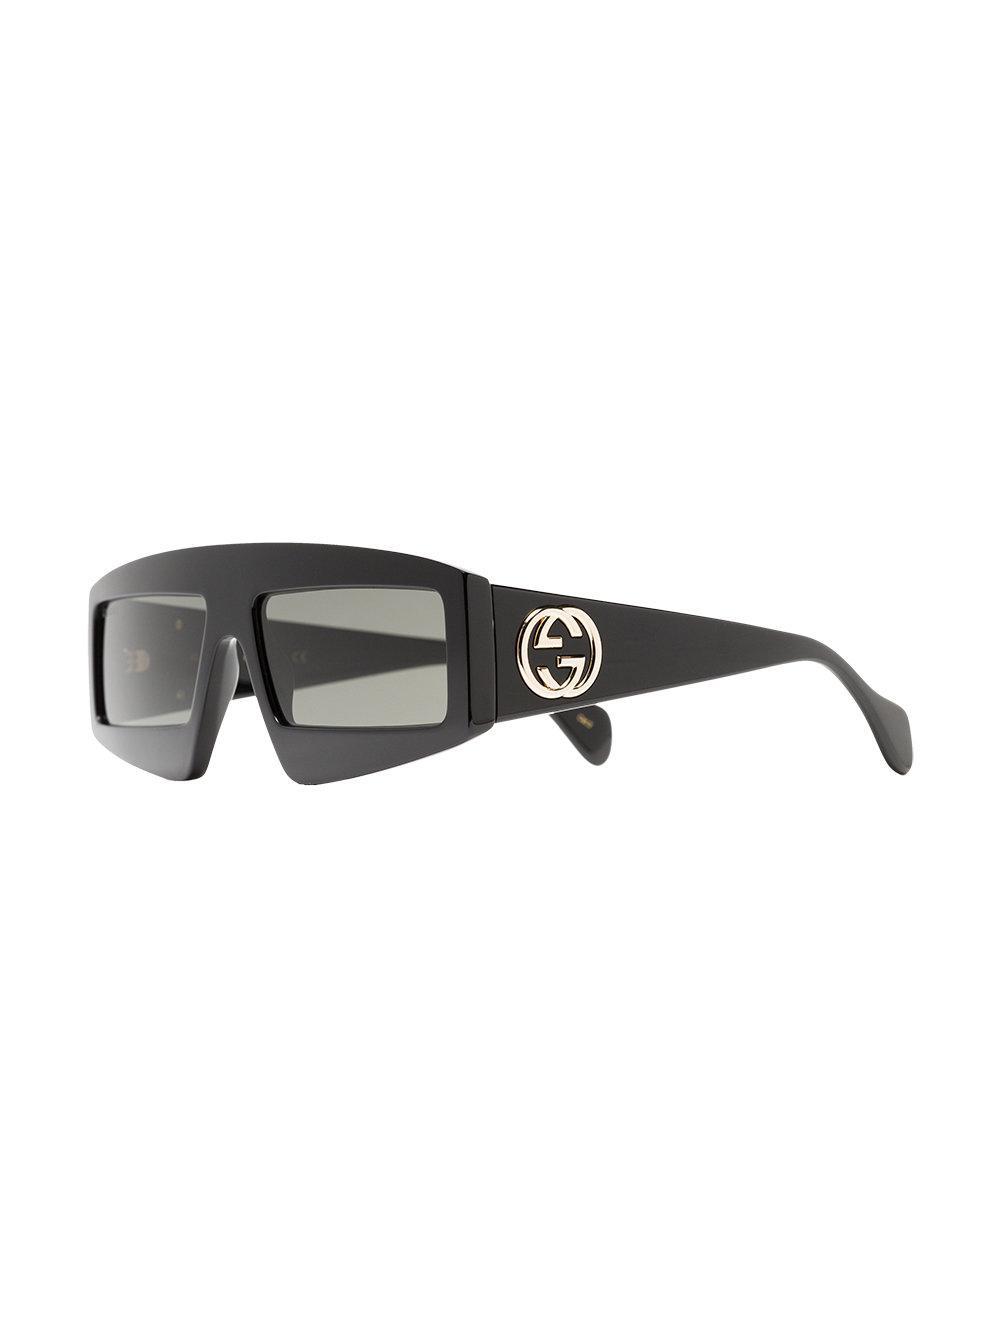 b47f107a9ed Lyst - Gucci Black Rectangular-frame Sunglasses in Black for Men